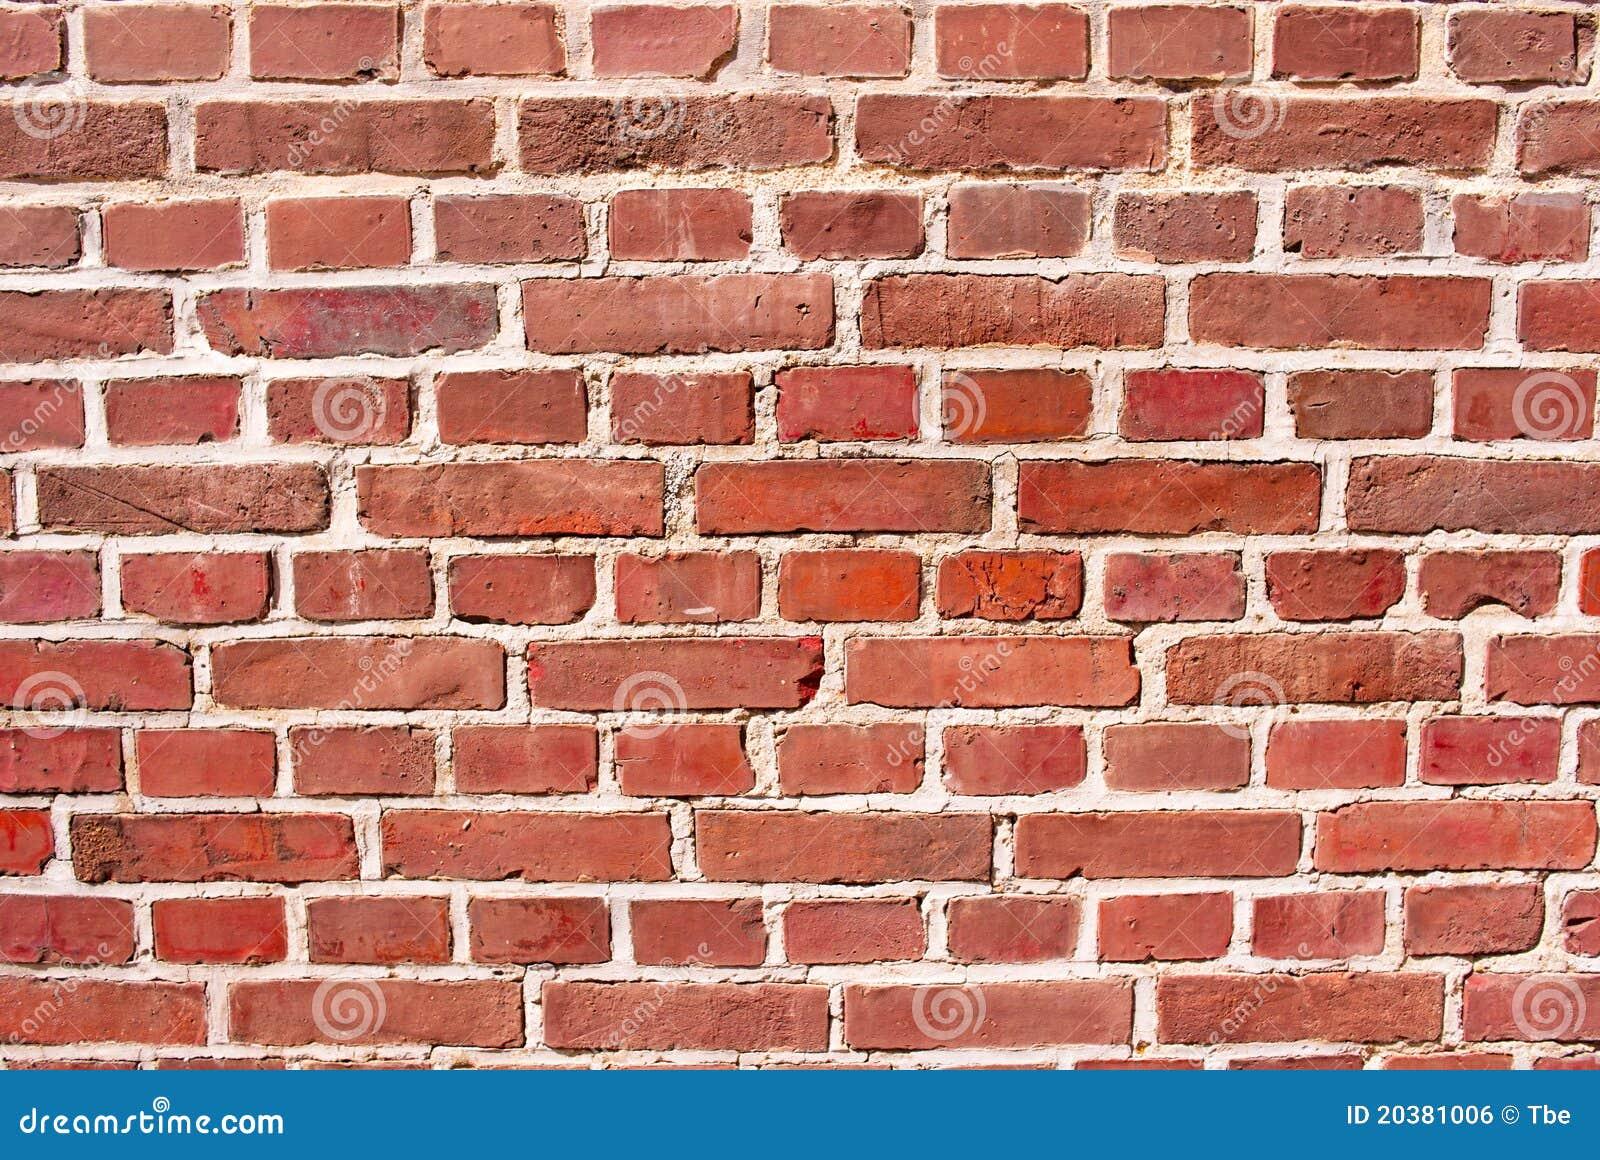 Red brick background royalty free stock image image - Papier peint imitation brique relief ...